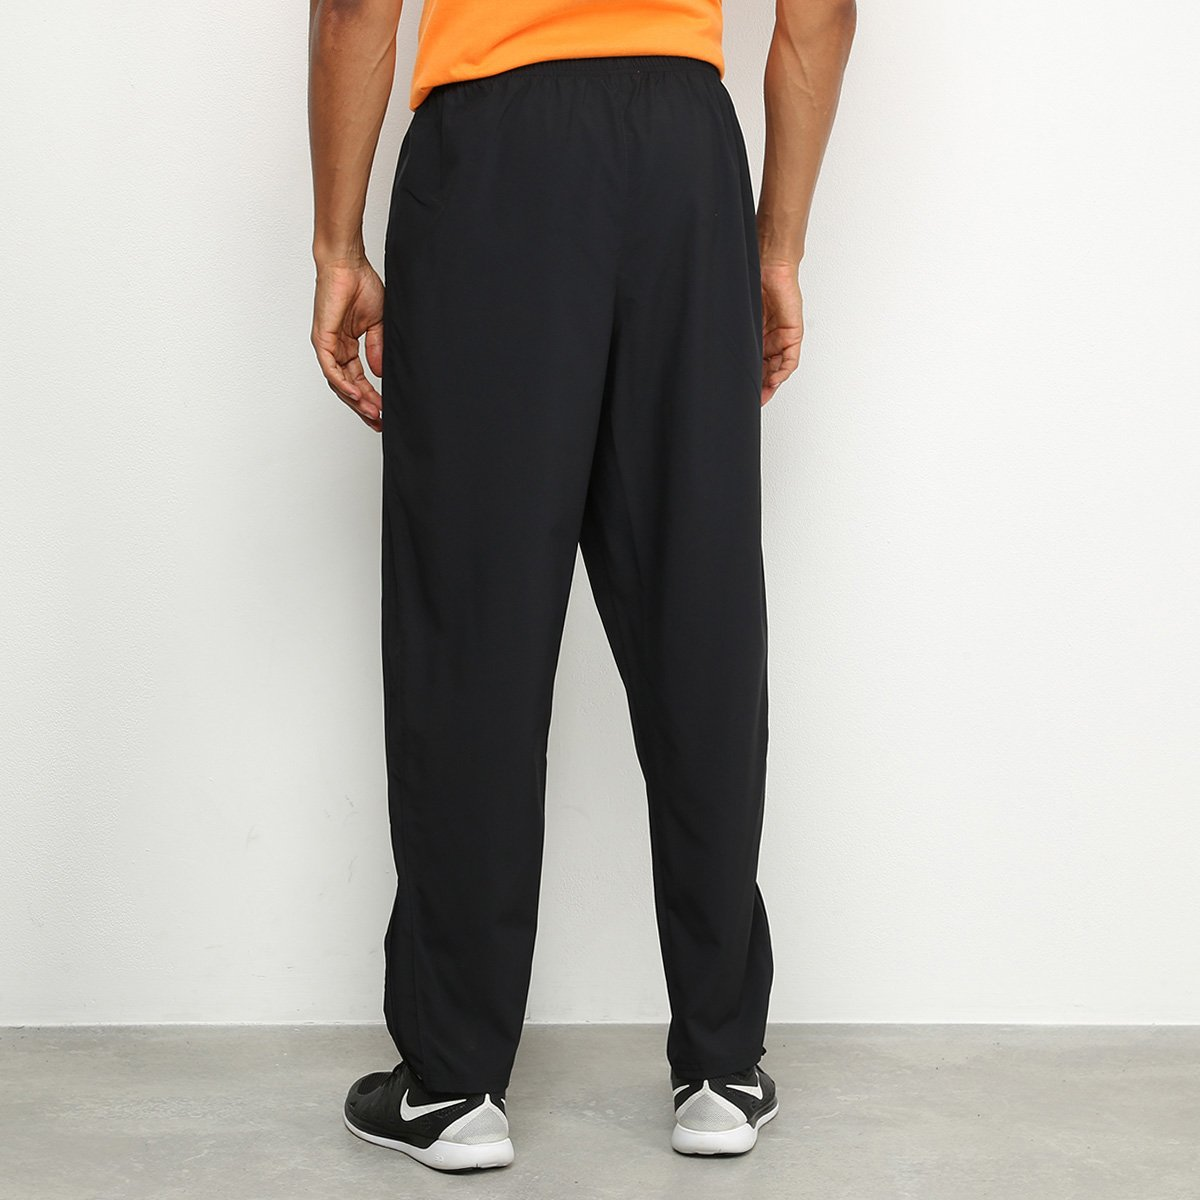 Calça Nike Run Stripe Woven Masculina - Tam: G - 1